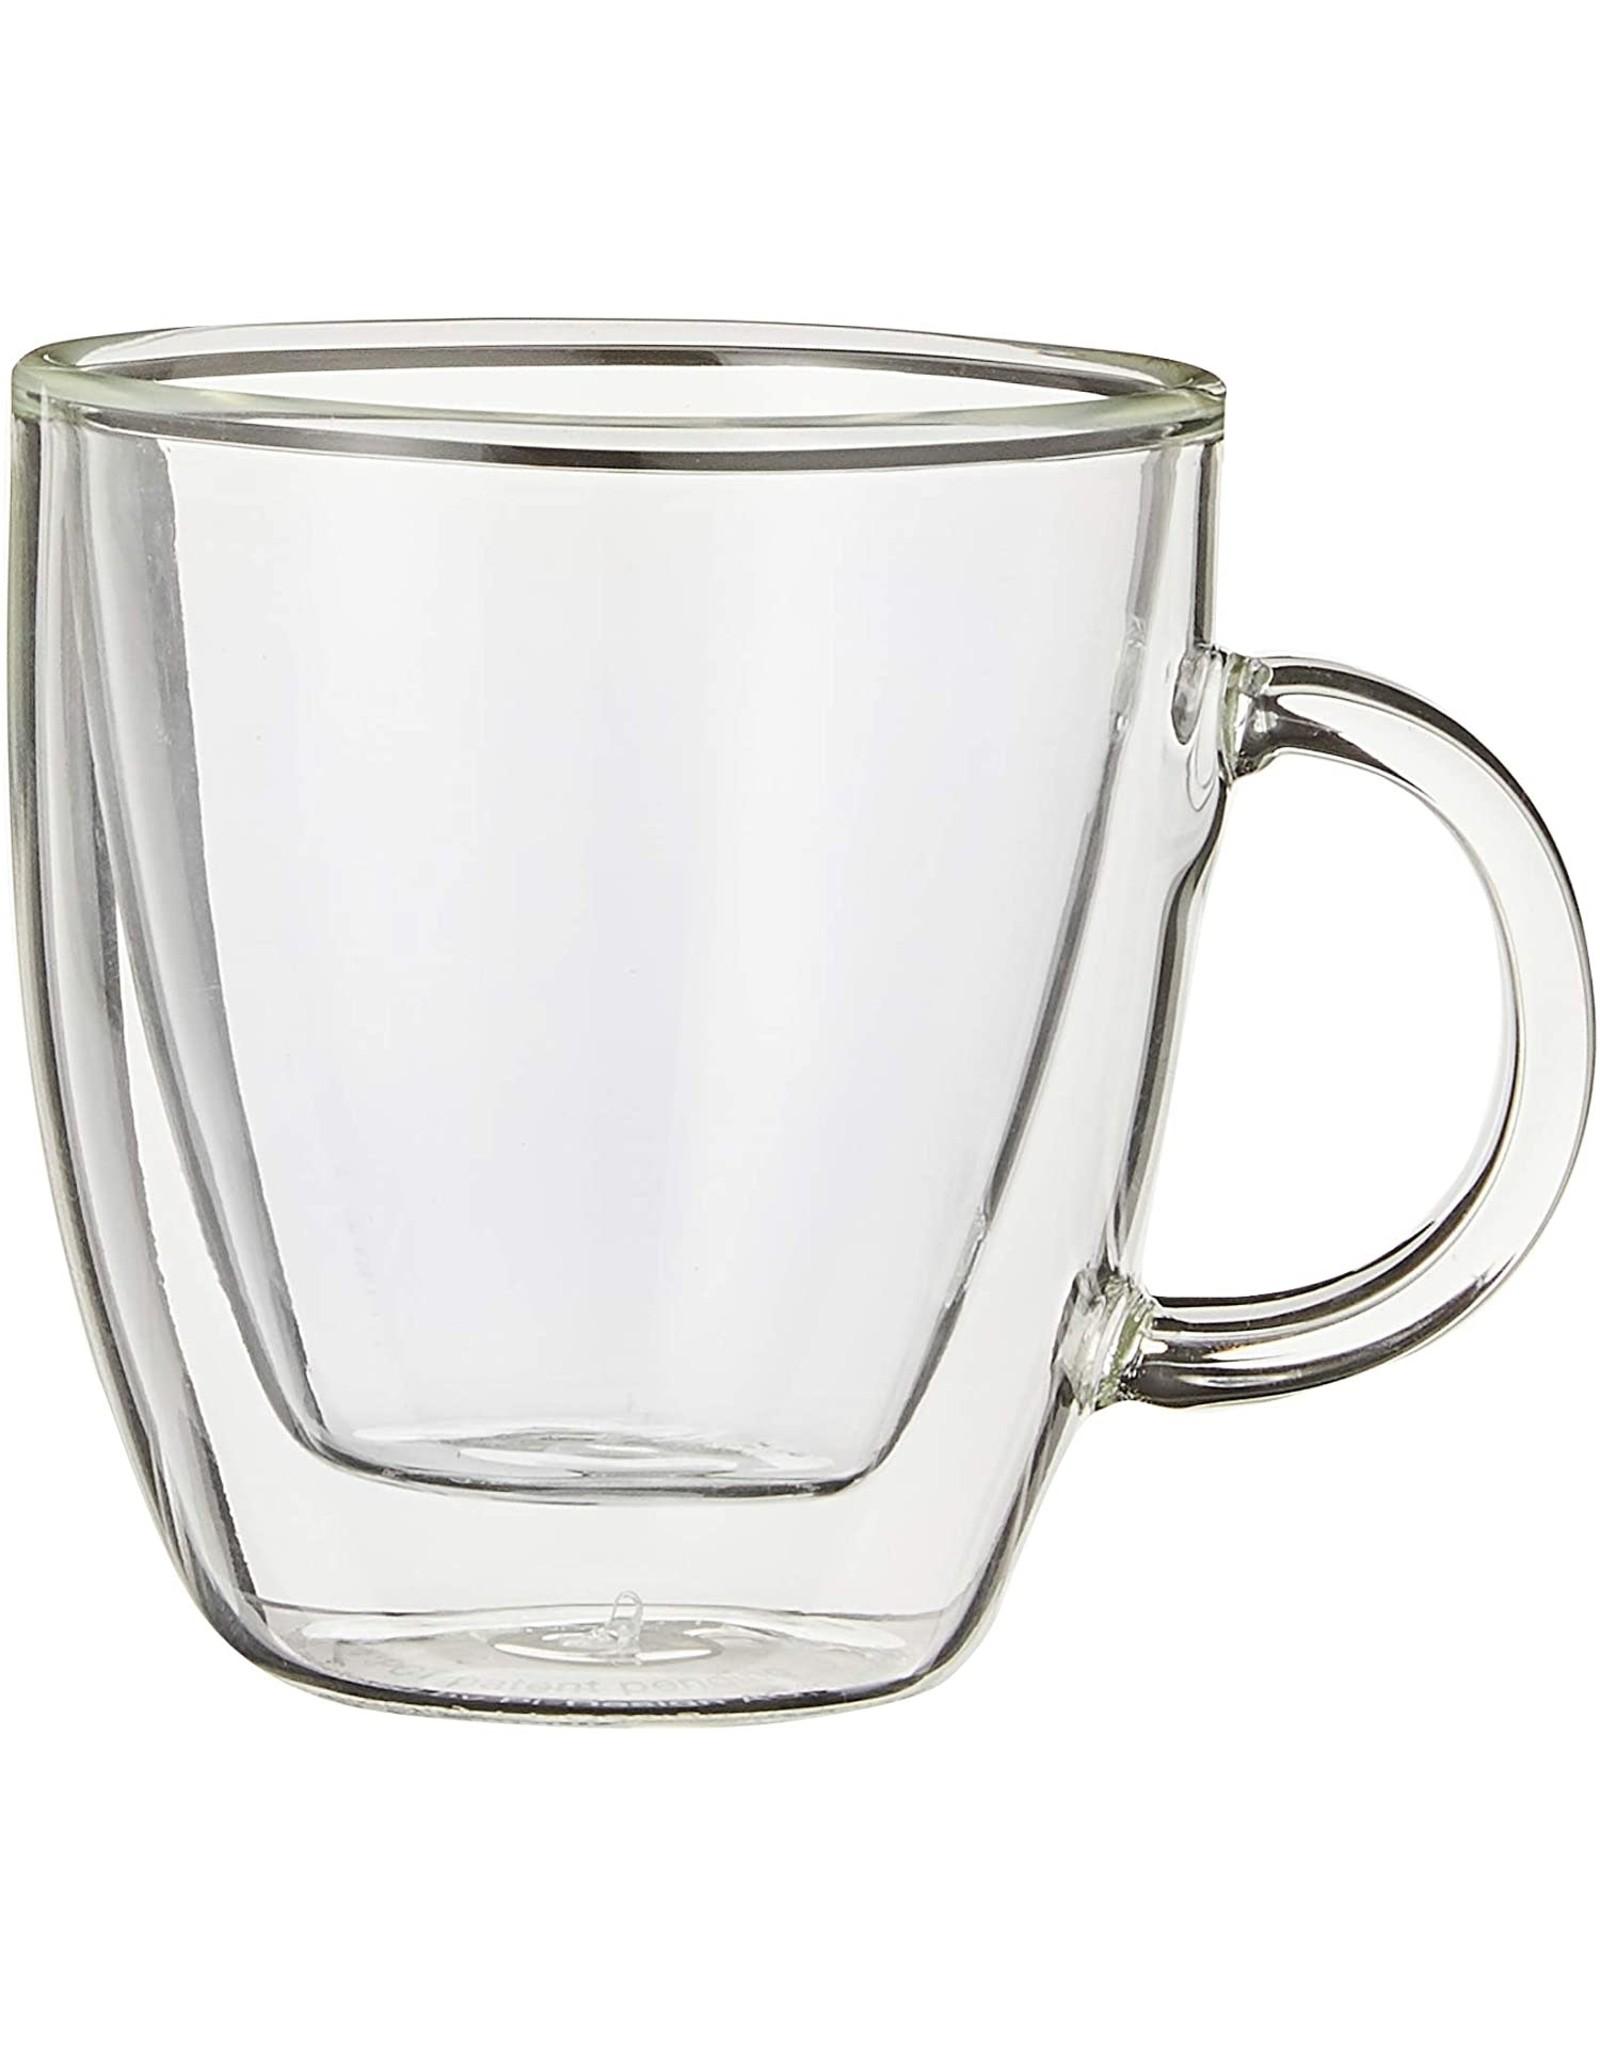 Bodum BISTRO double wall espresso mug 150mL 5 oz